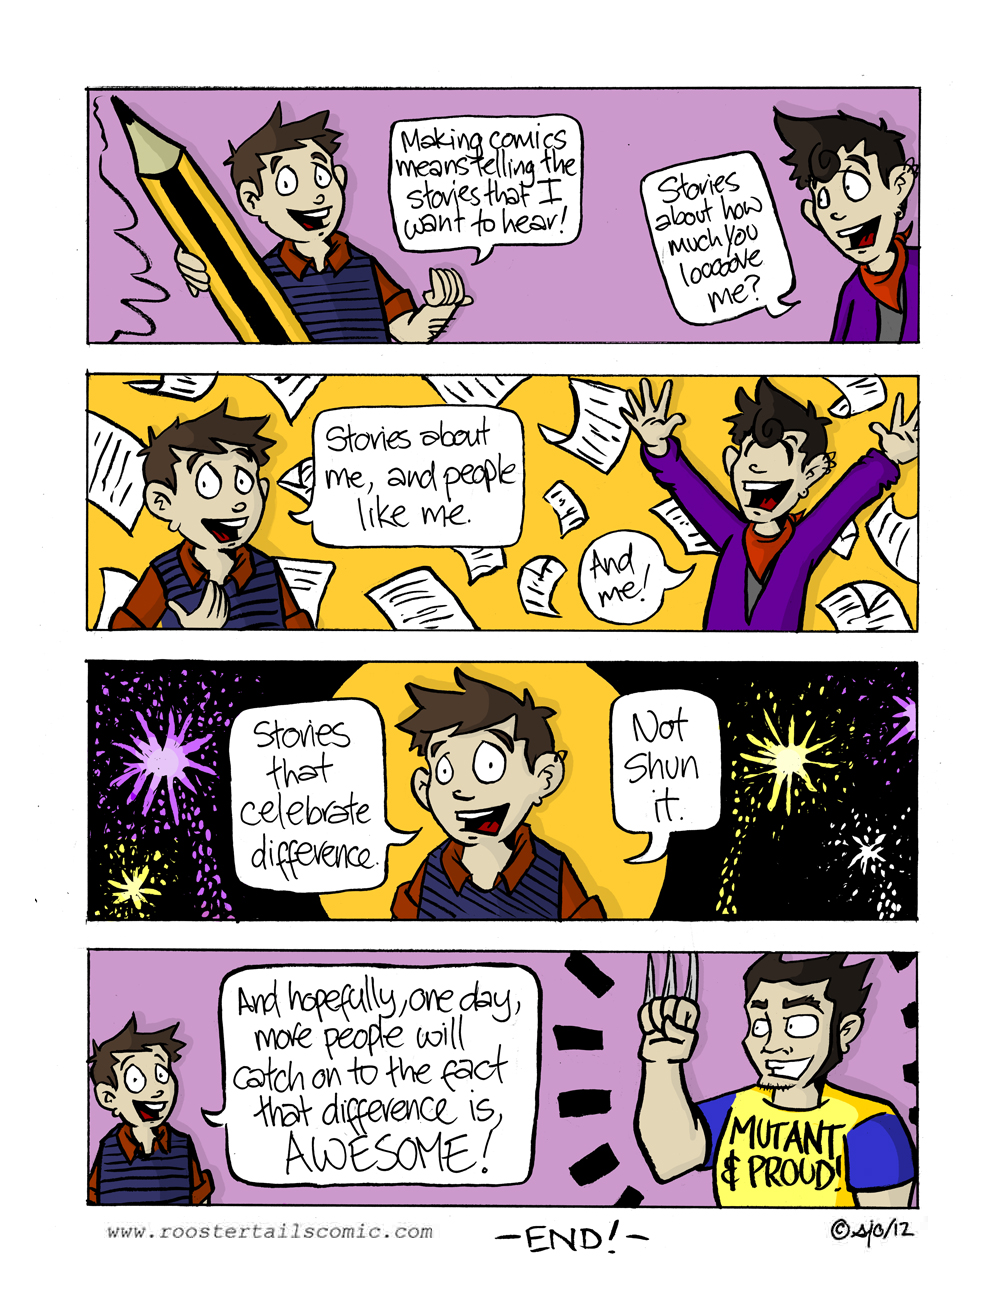 Aplogies to Wolverine :S